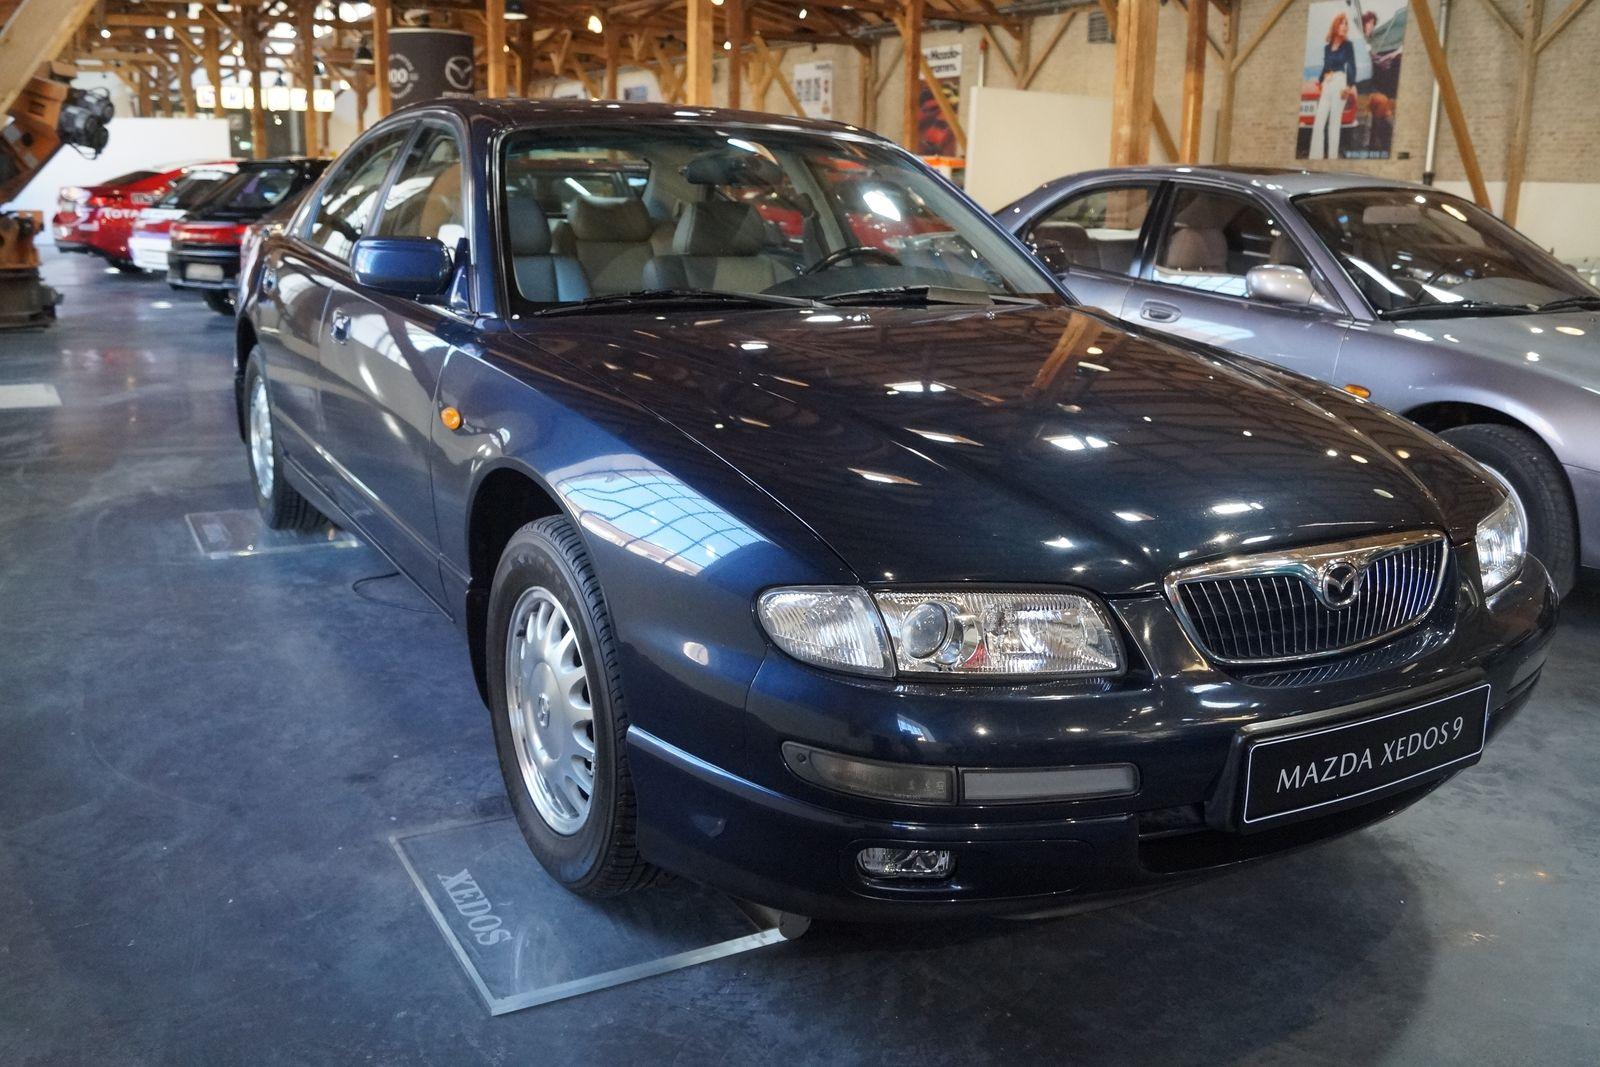 100 Jahre Mazda - Xedos 9